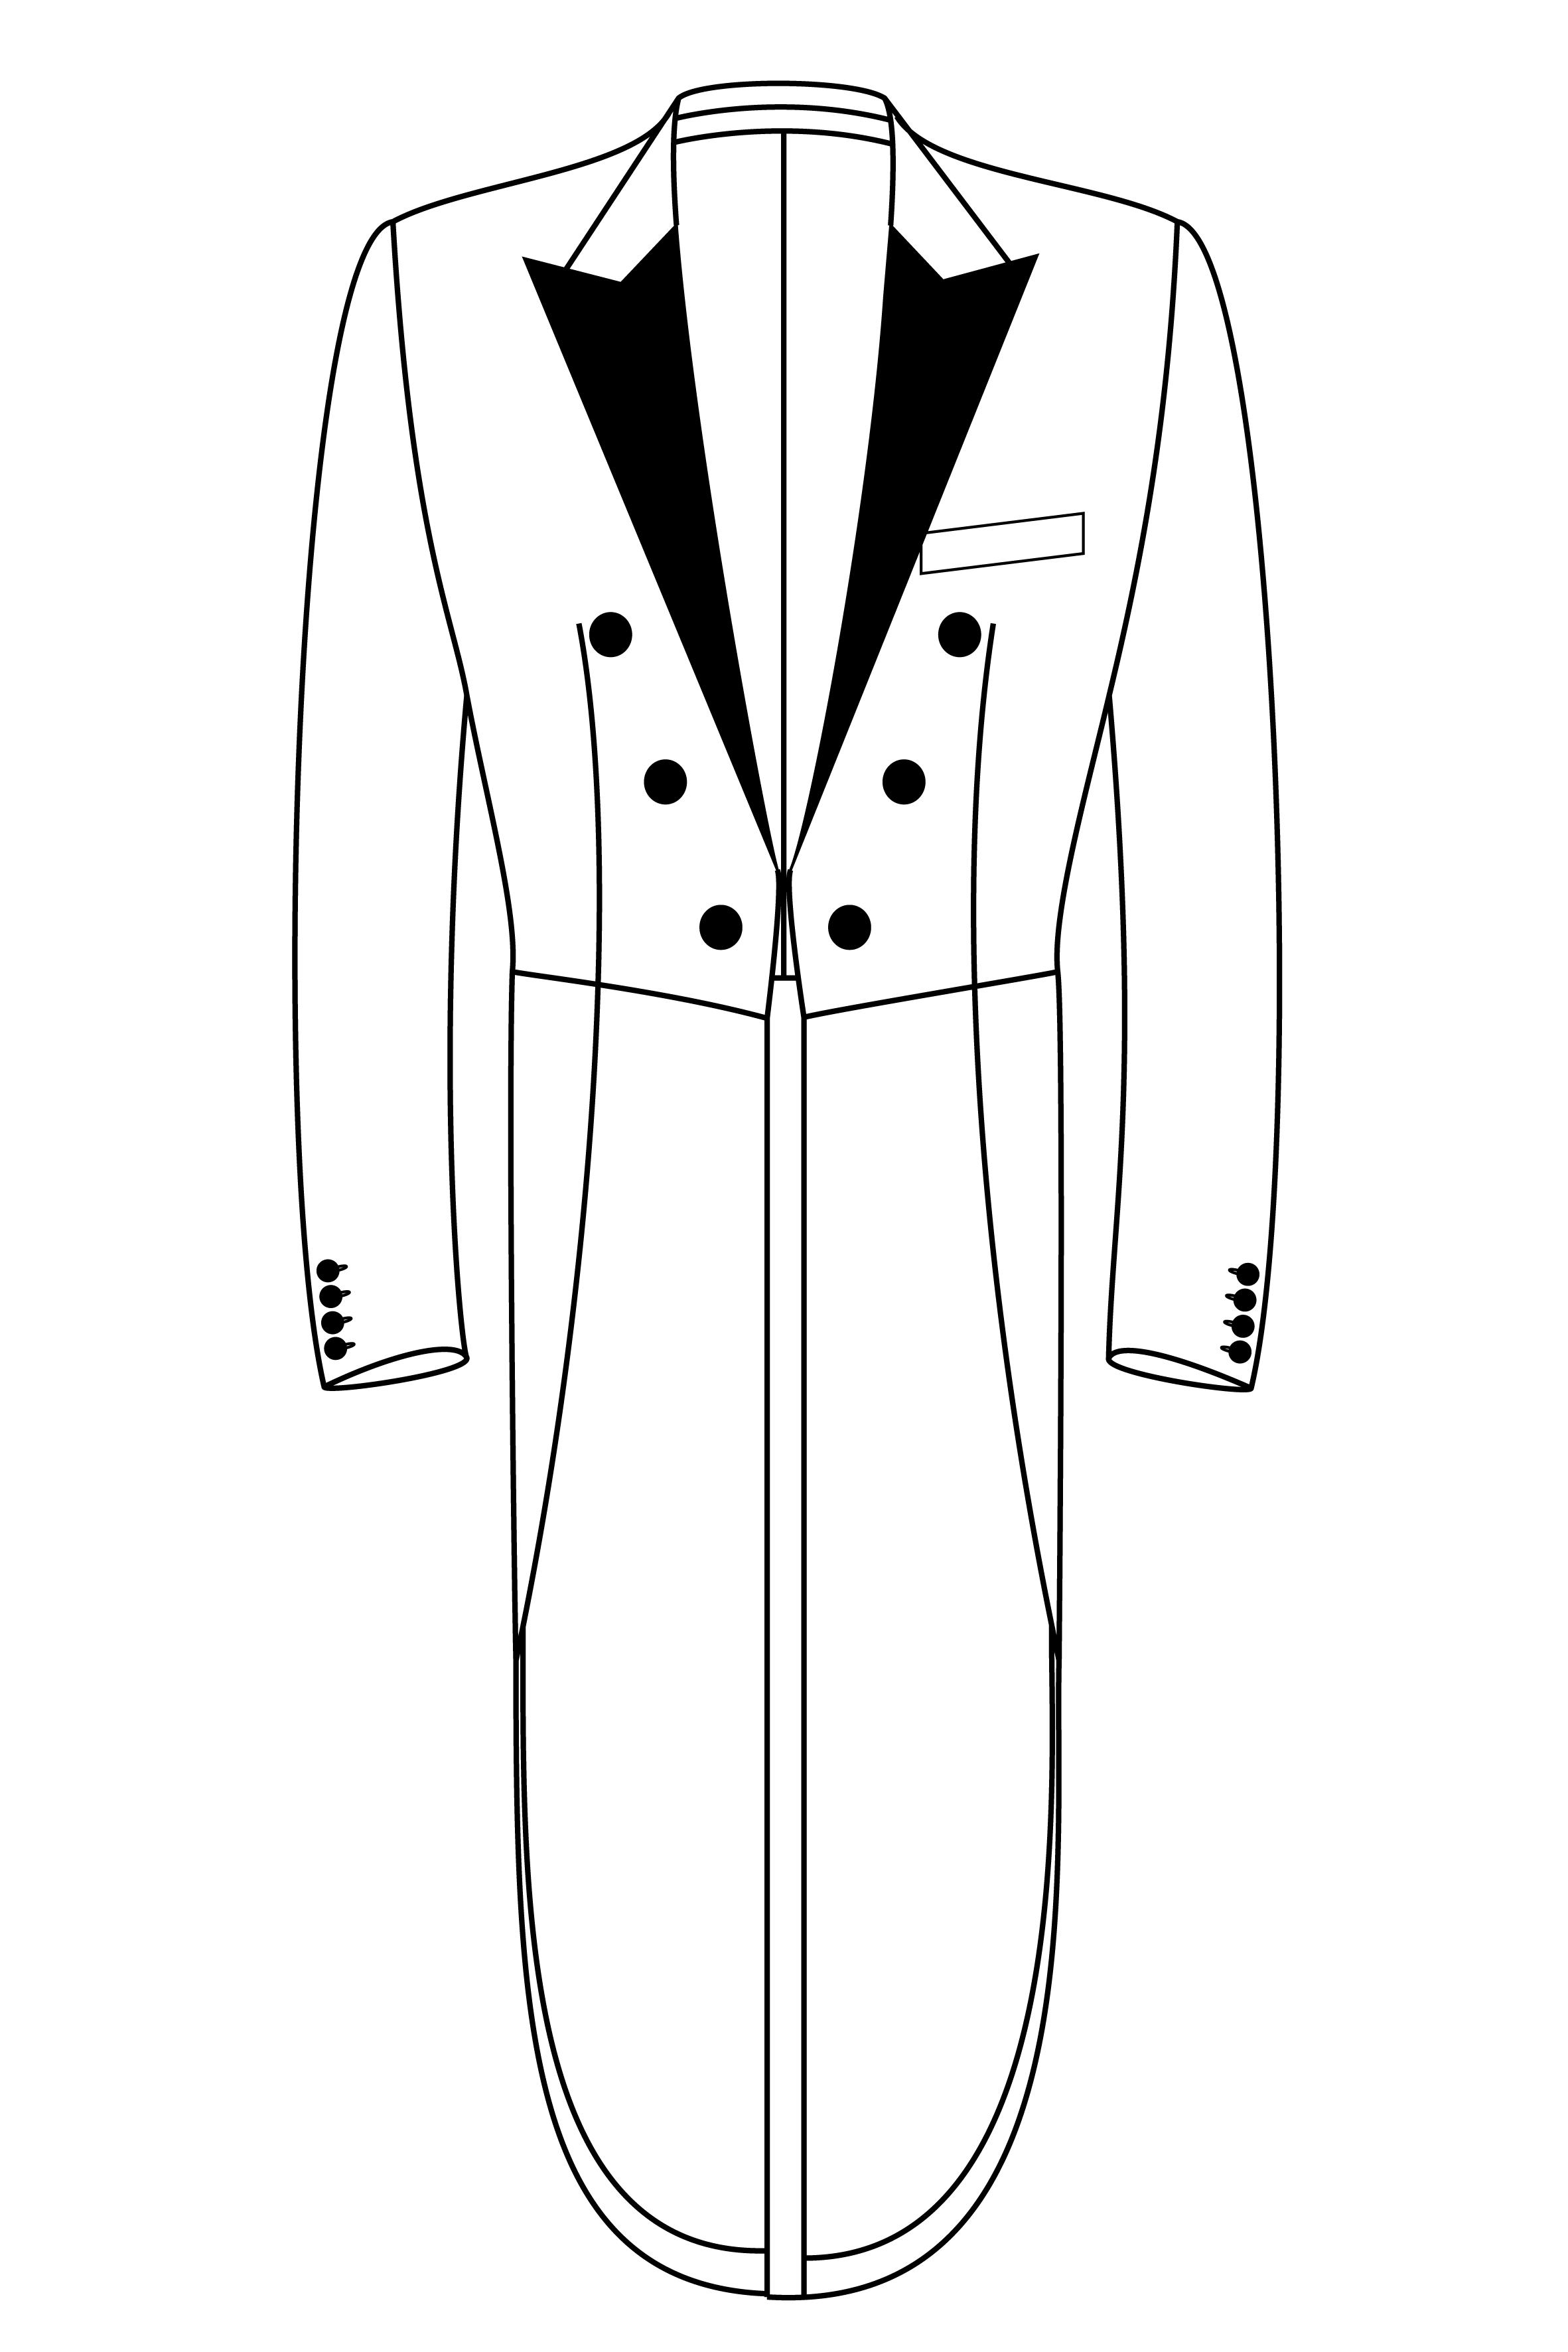 jacquet frock coat 2-01.png